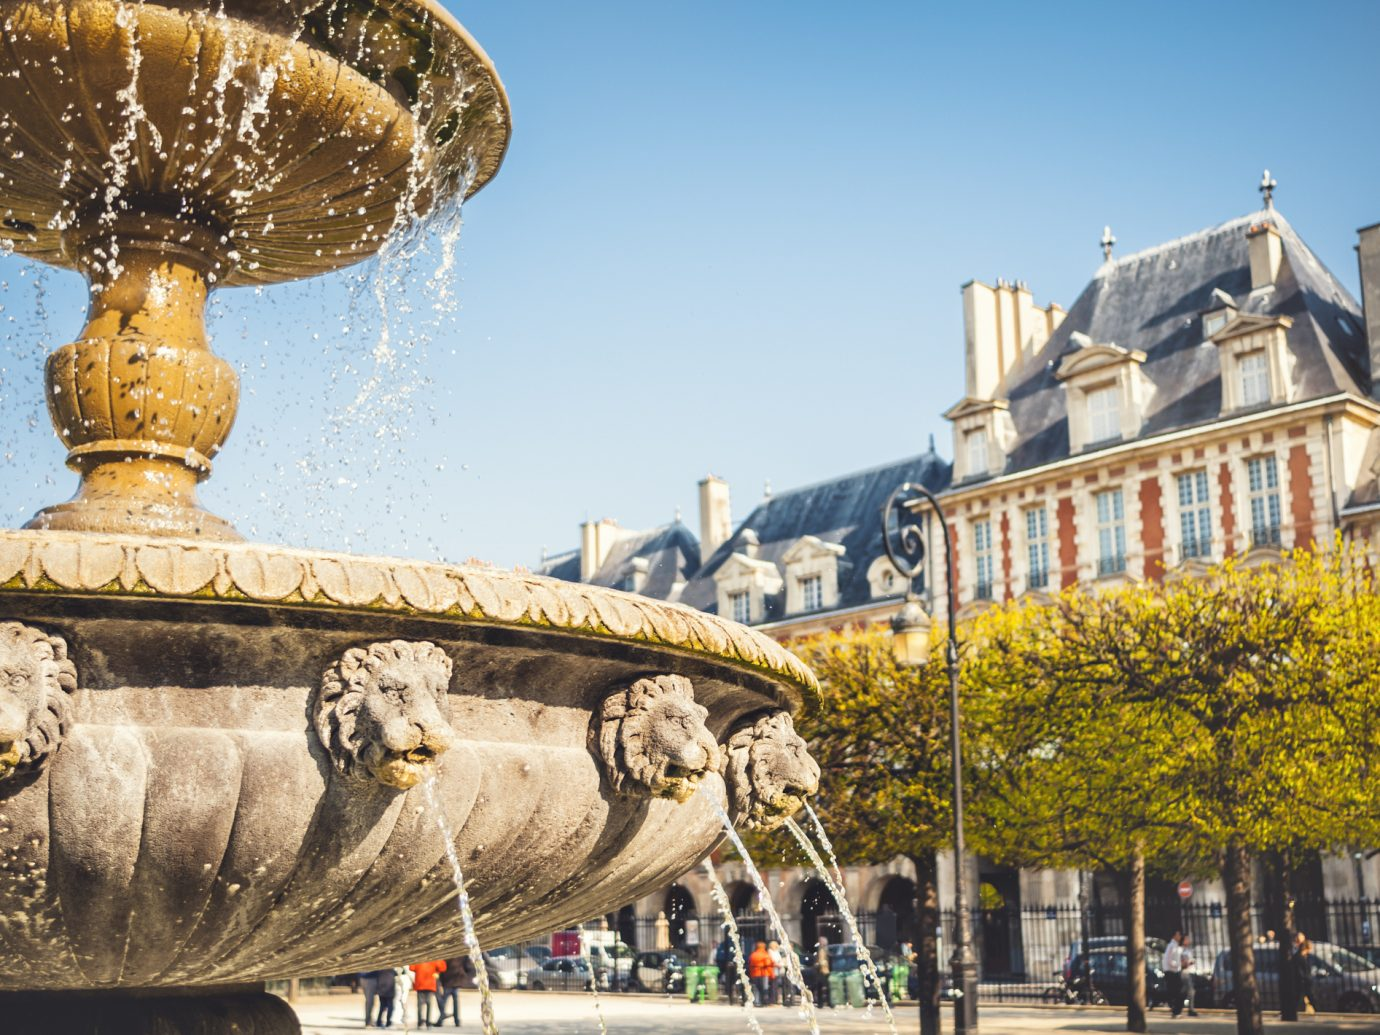 Fontain on the Place des Vosges in Paris. Toned picture.